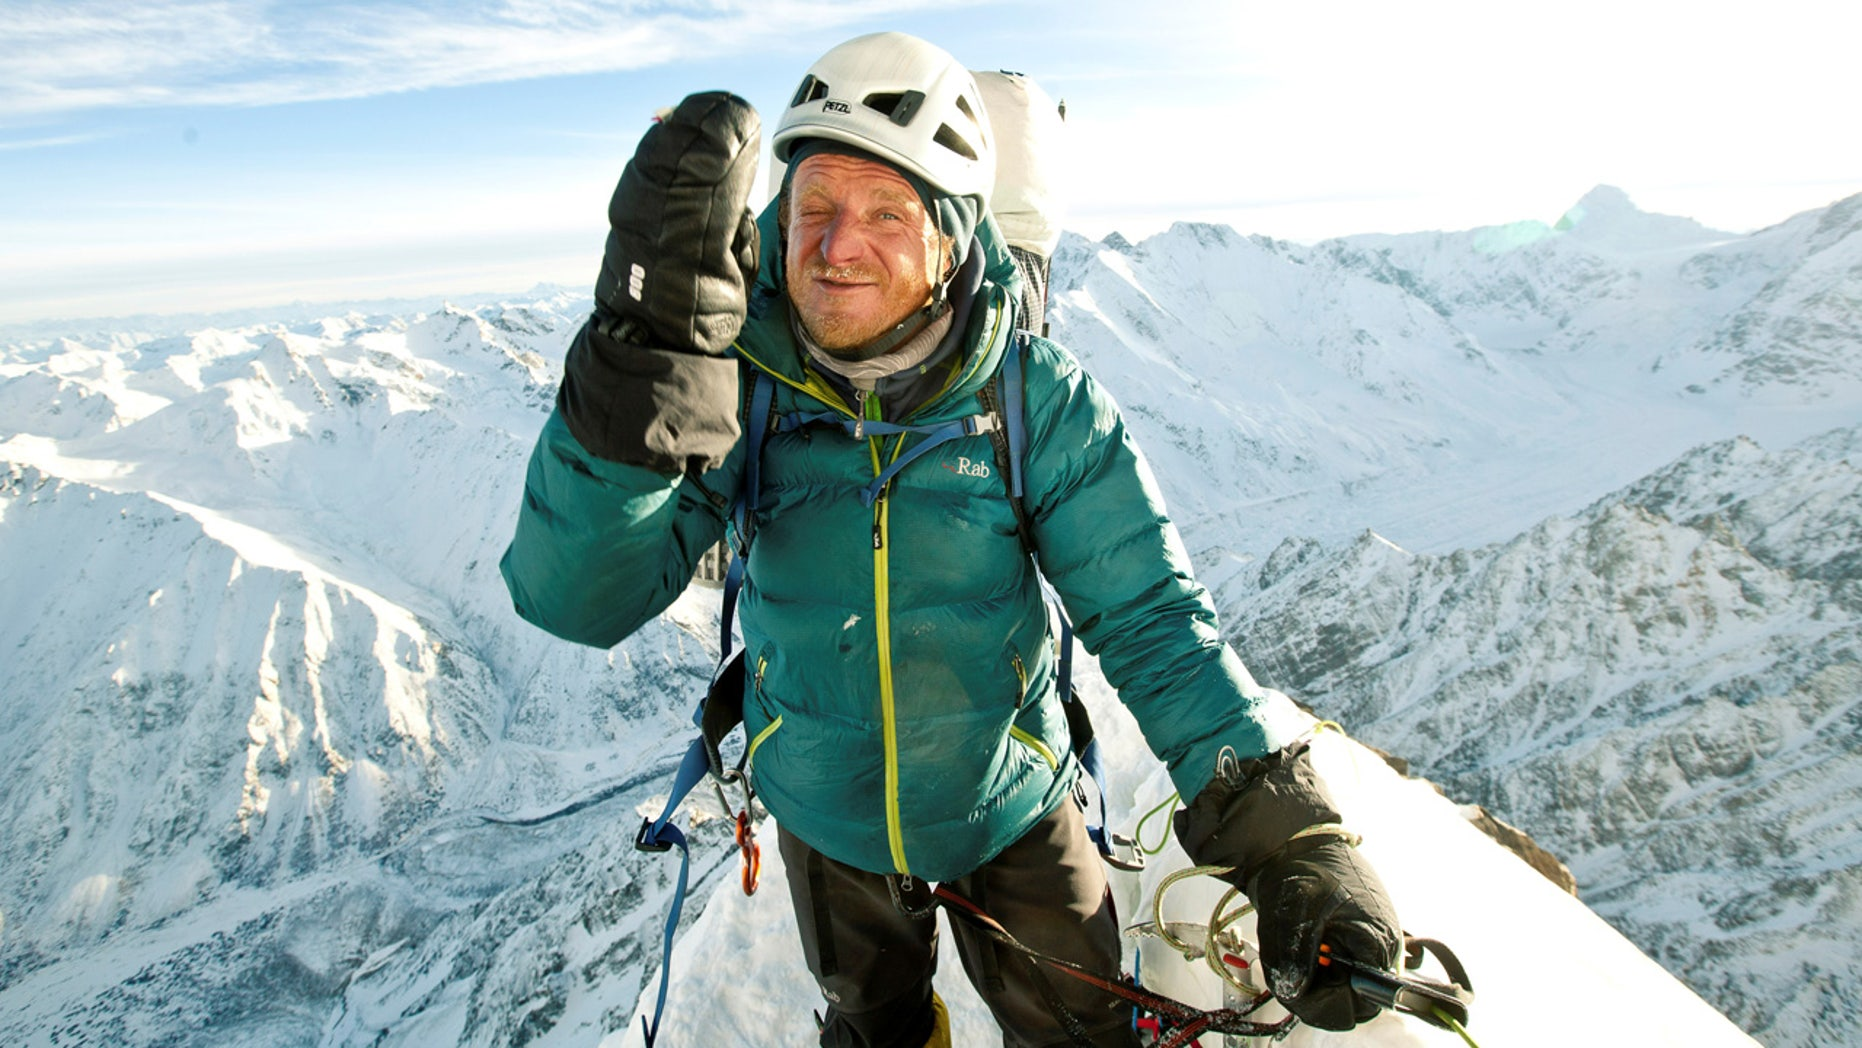 Polish climber Tomasz Mackiewicz during his trip on Nanga Parbat mountain in Pakistan January 2014.